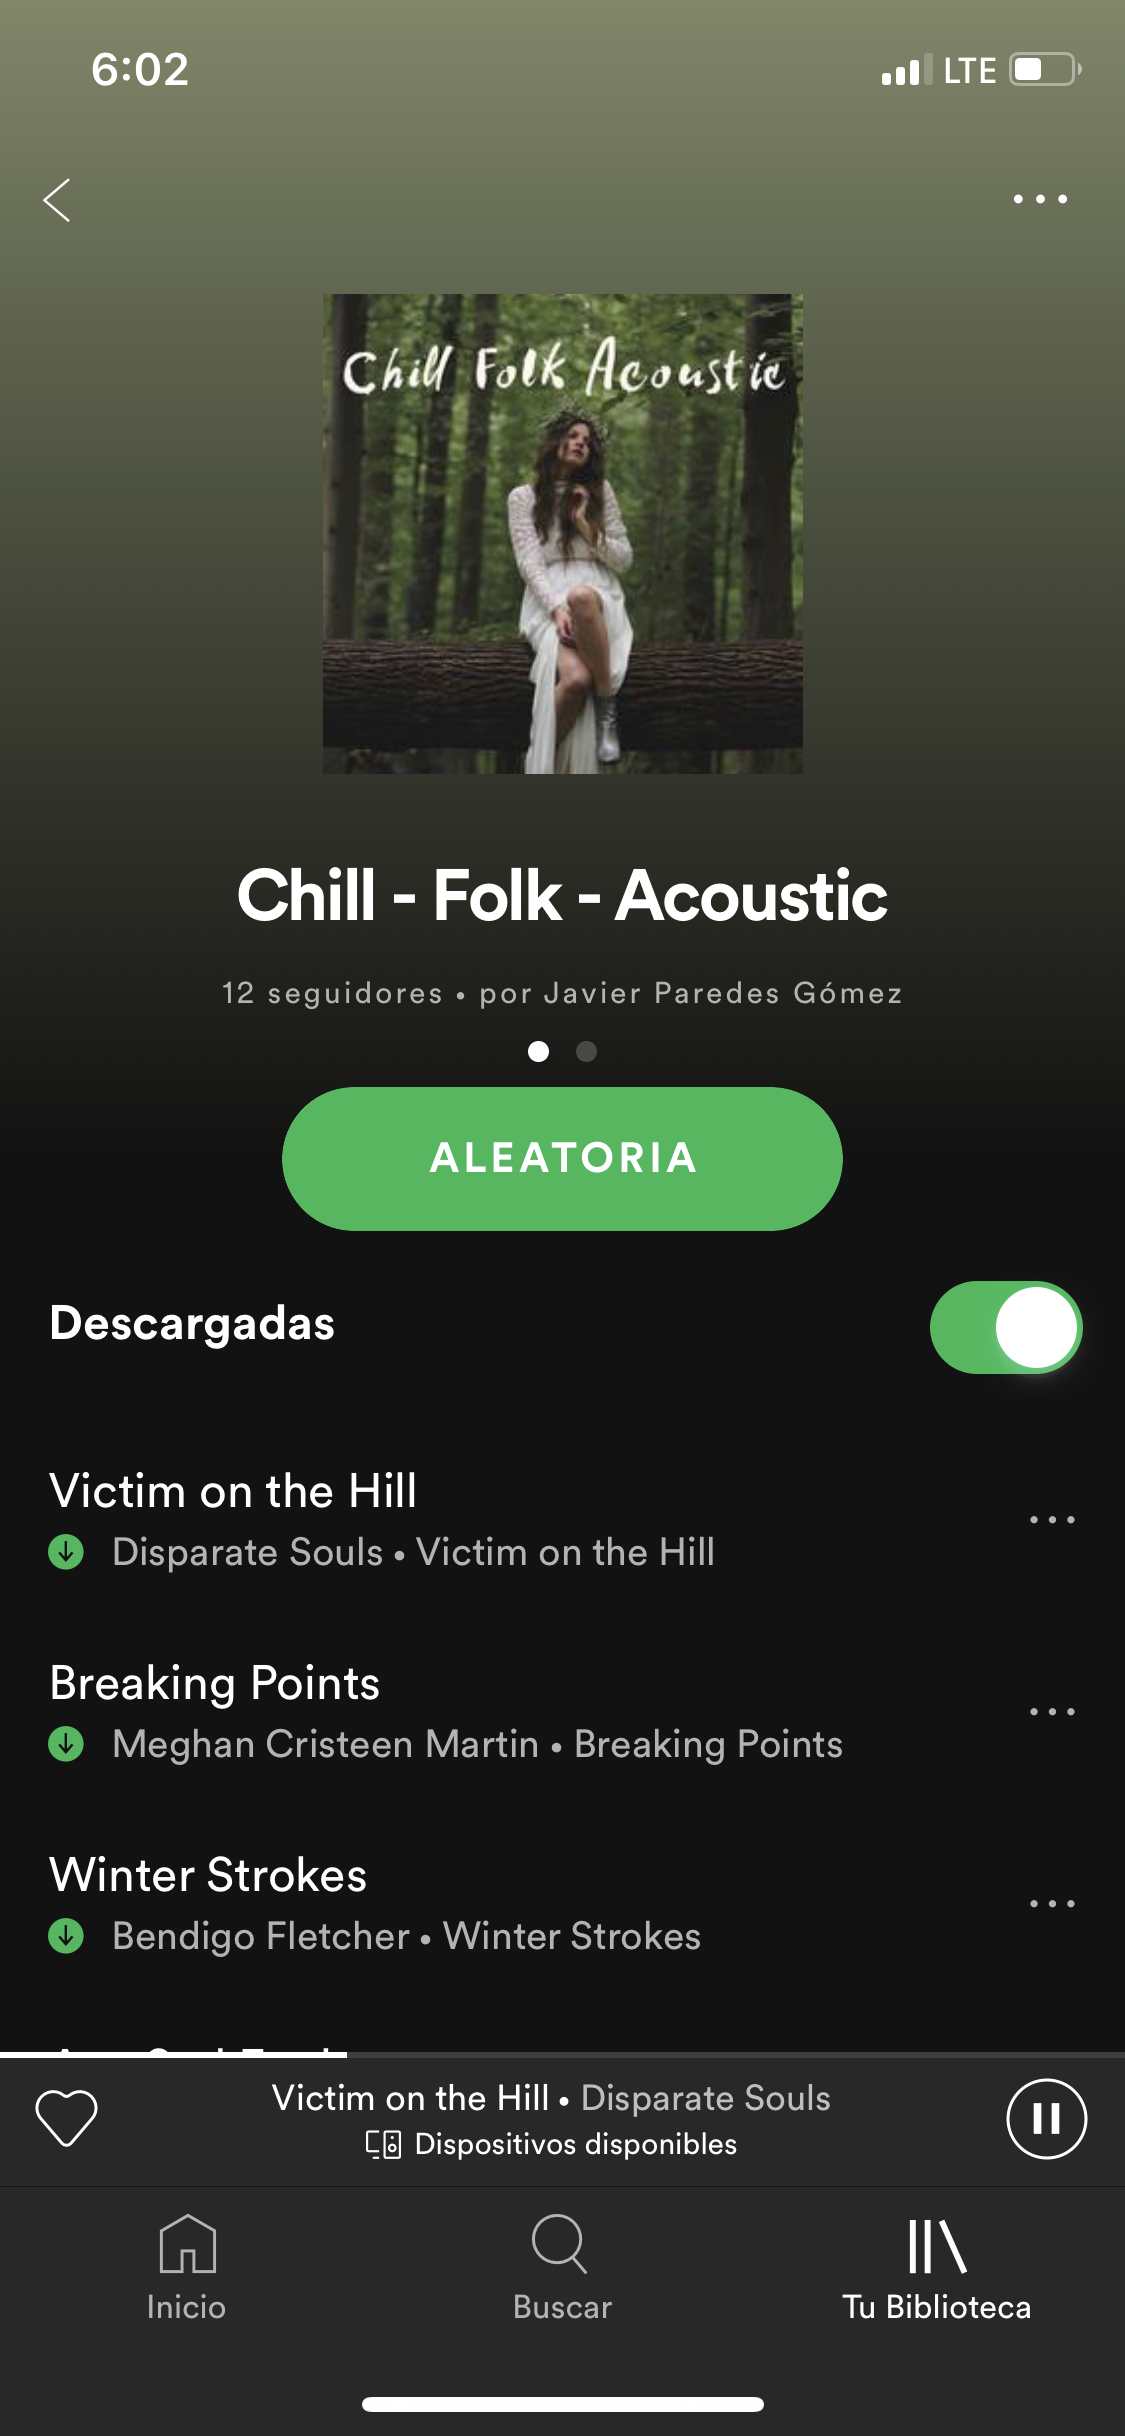 Chill - Folk - Acoustic - The Spotify Community